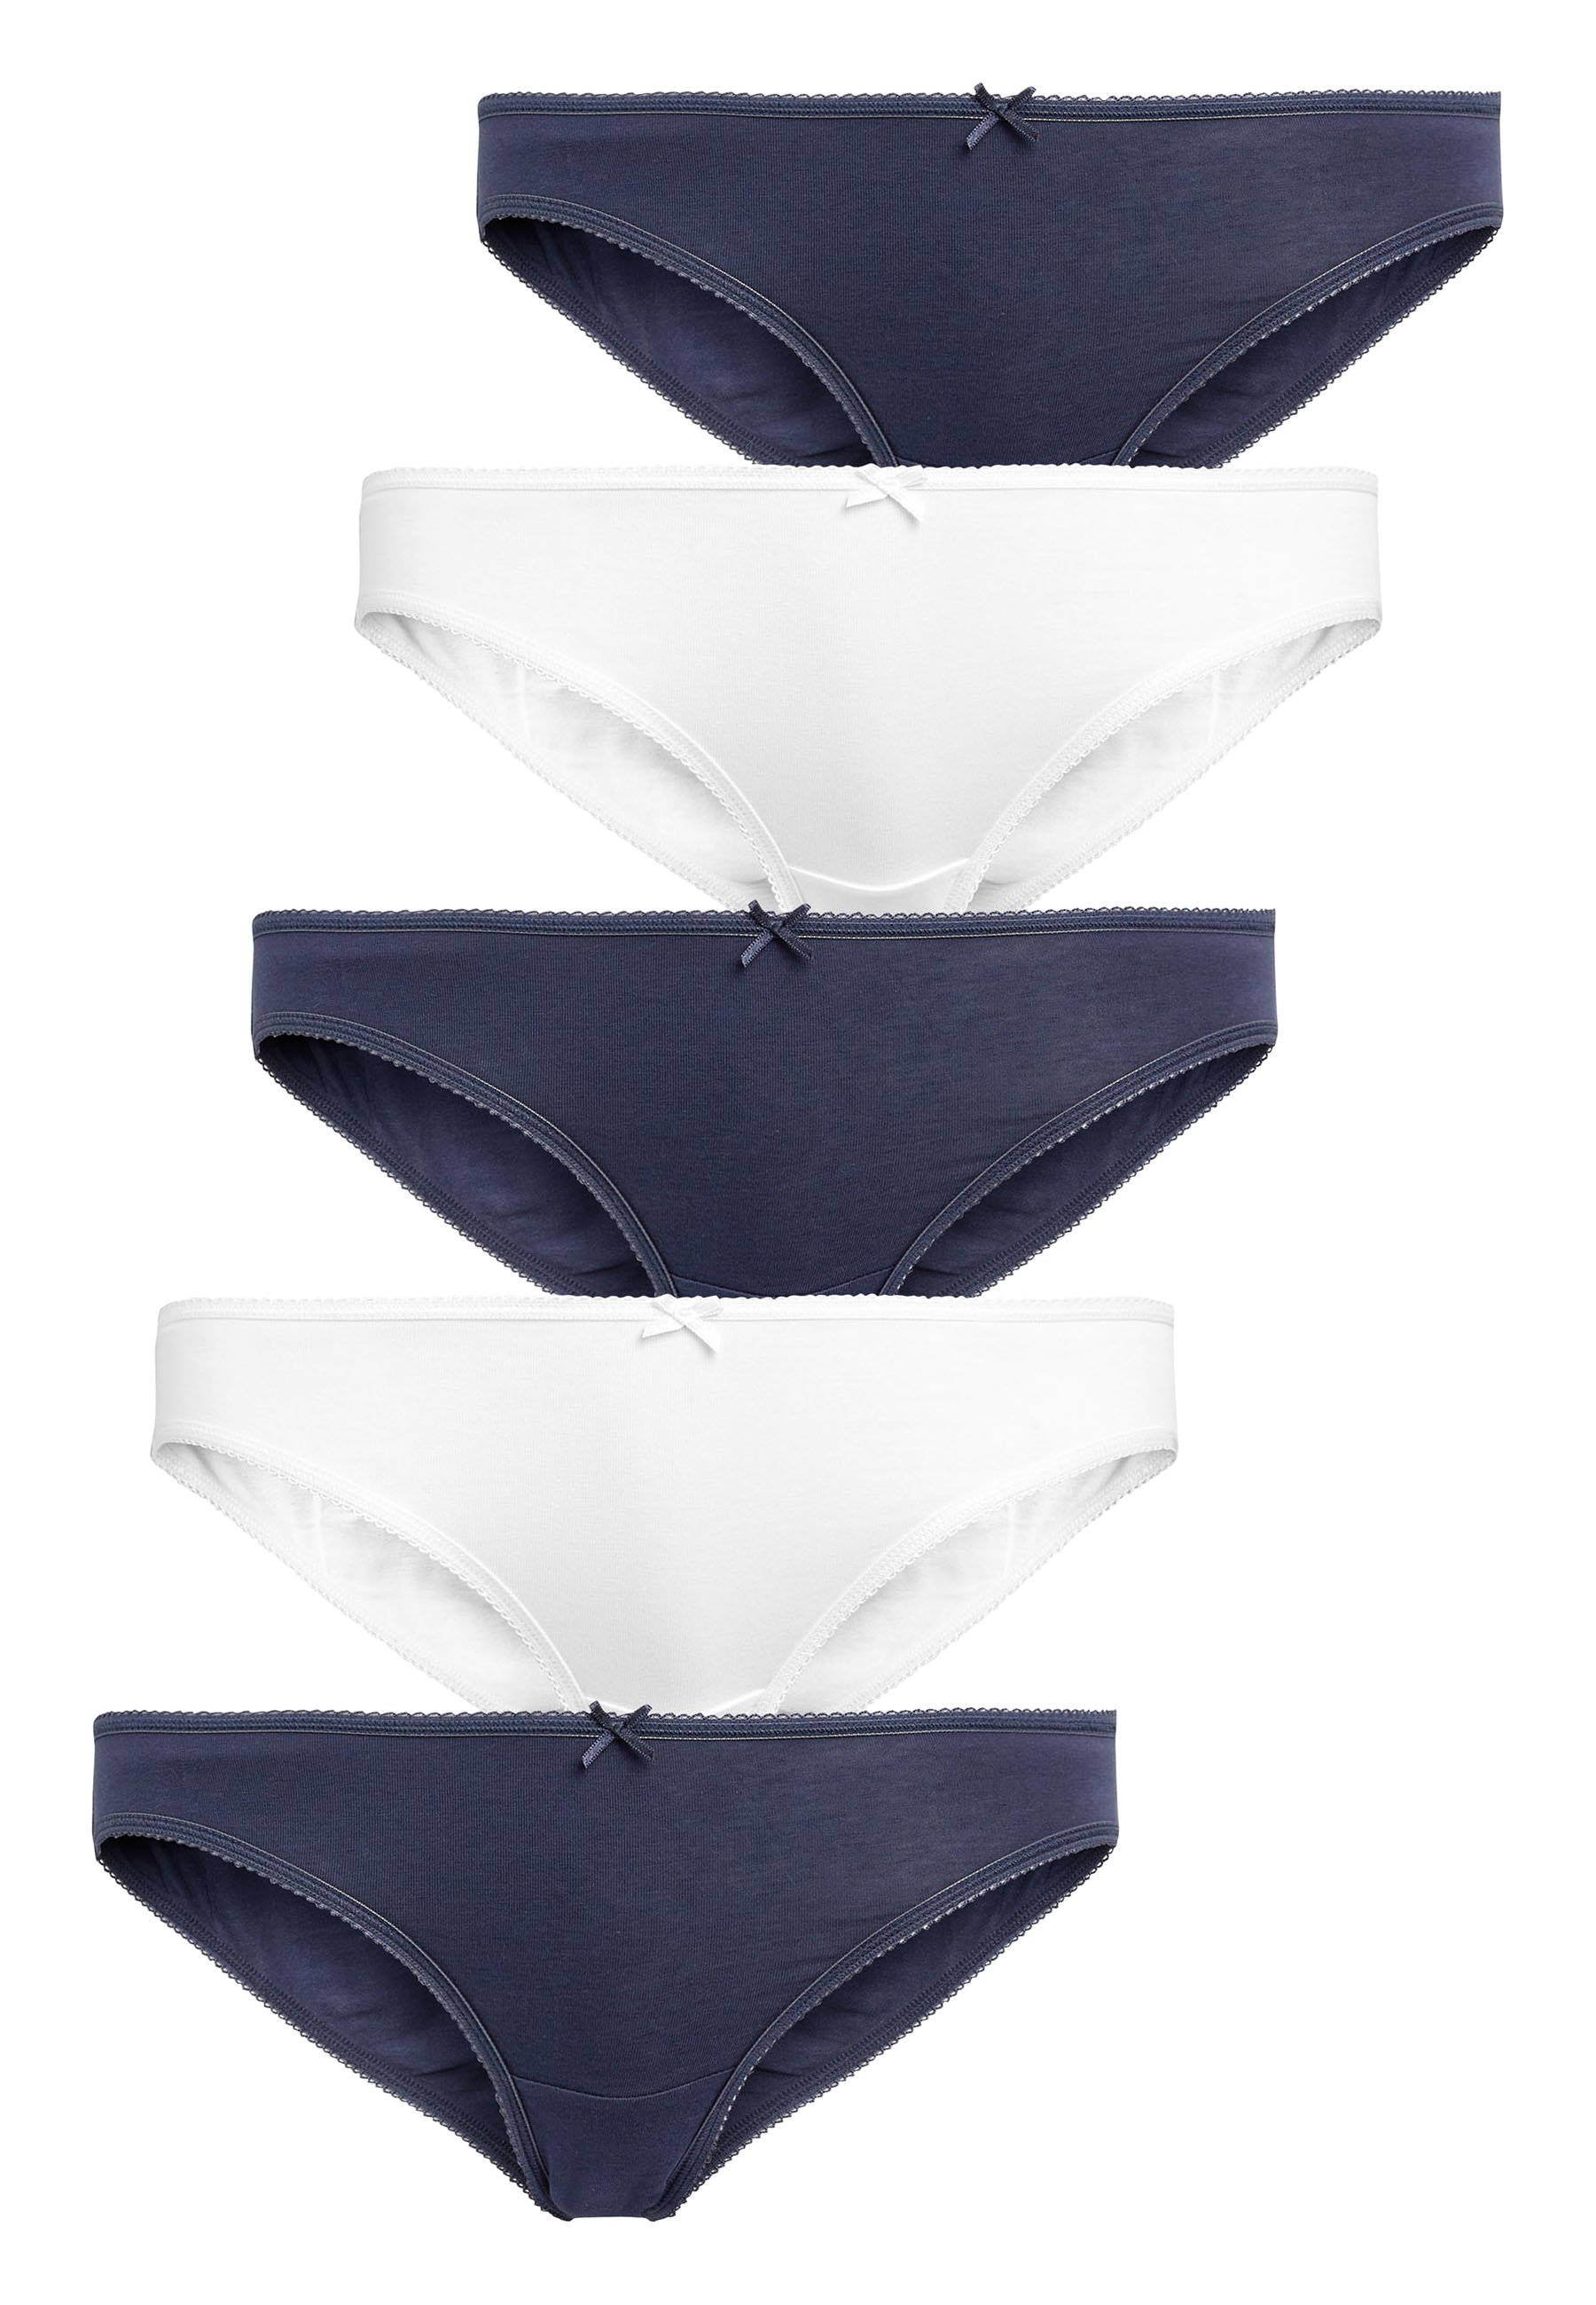 Donna NAVY/WHITE BIKINI COTTON KNICKERS FIVE PACK - Slip